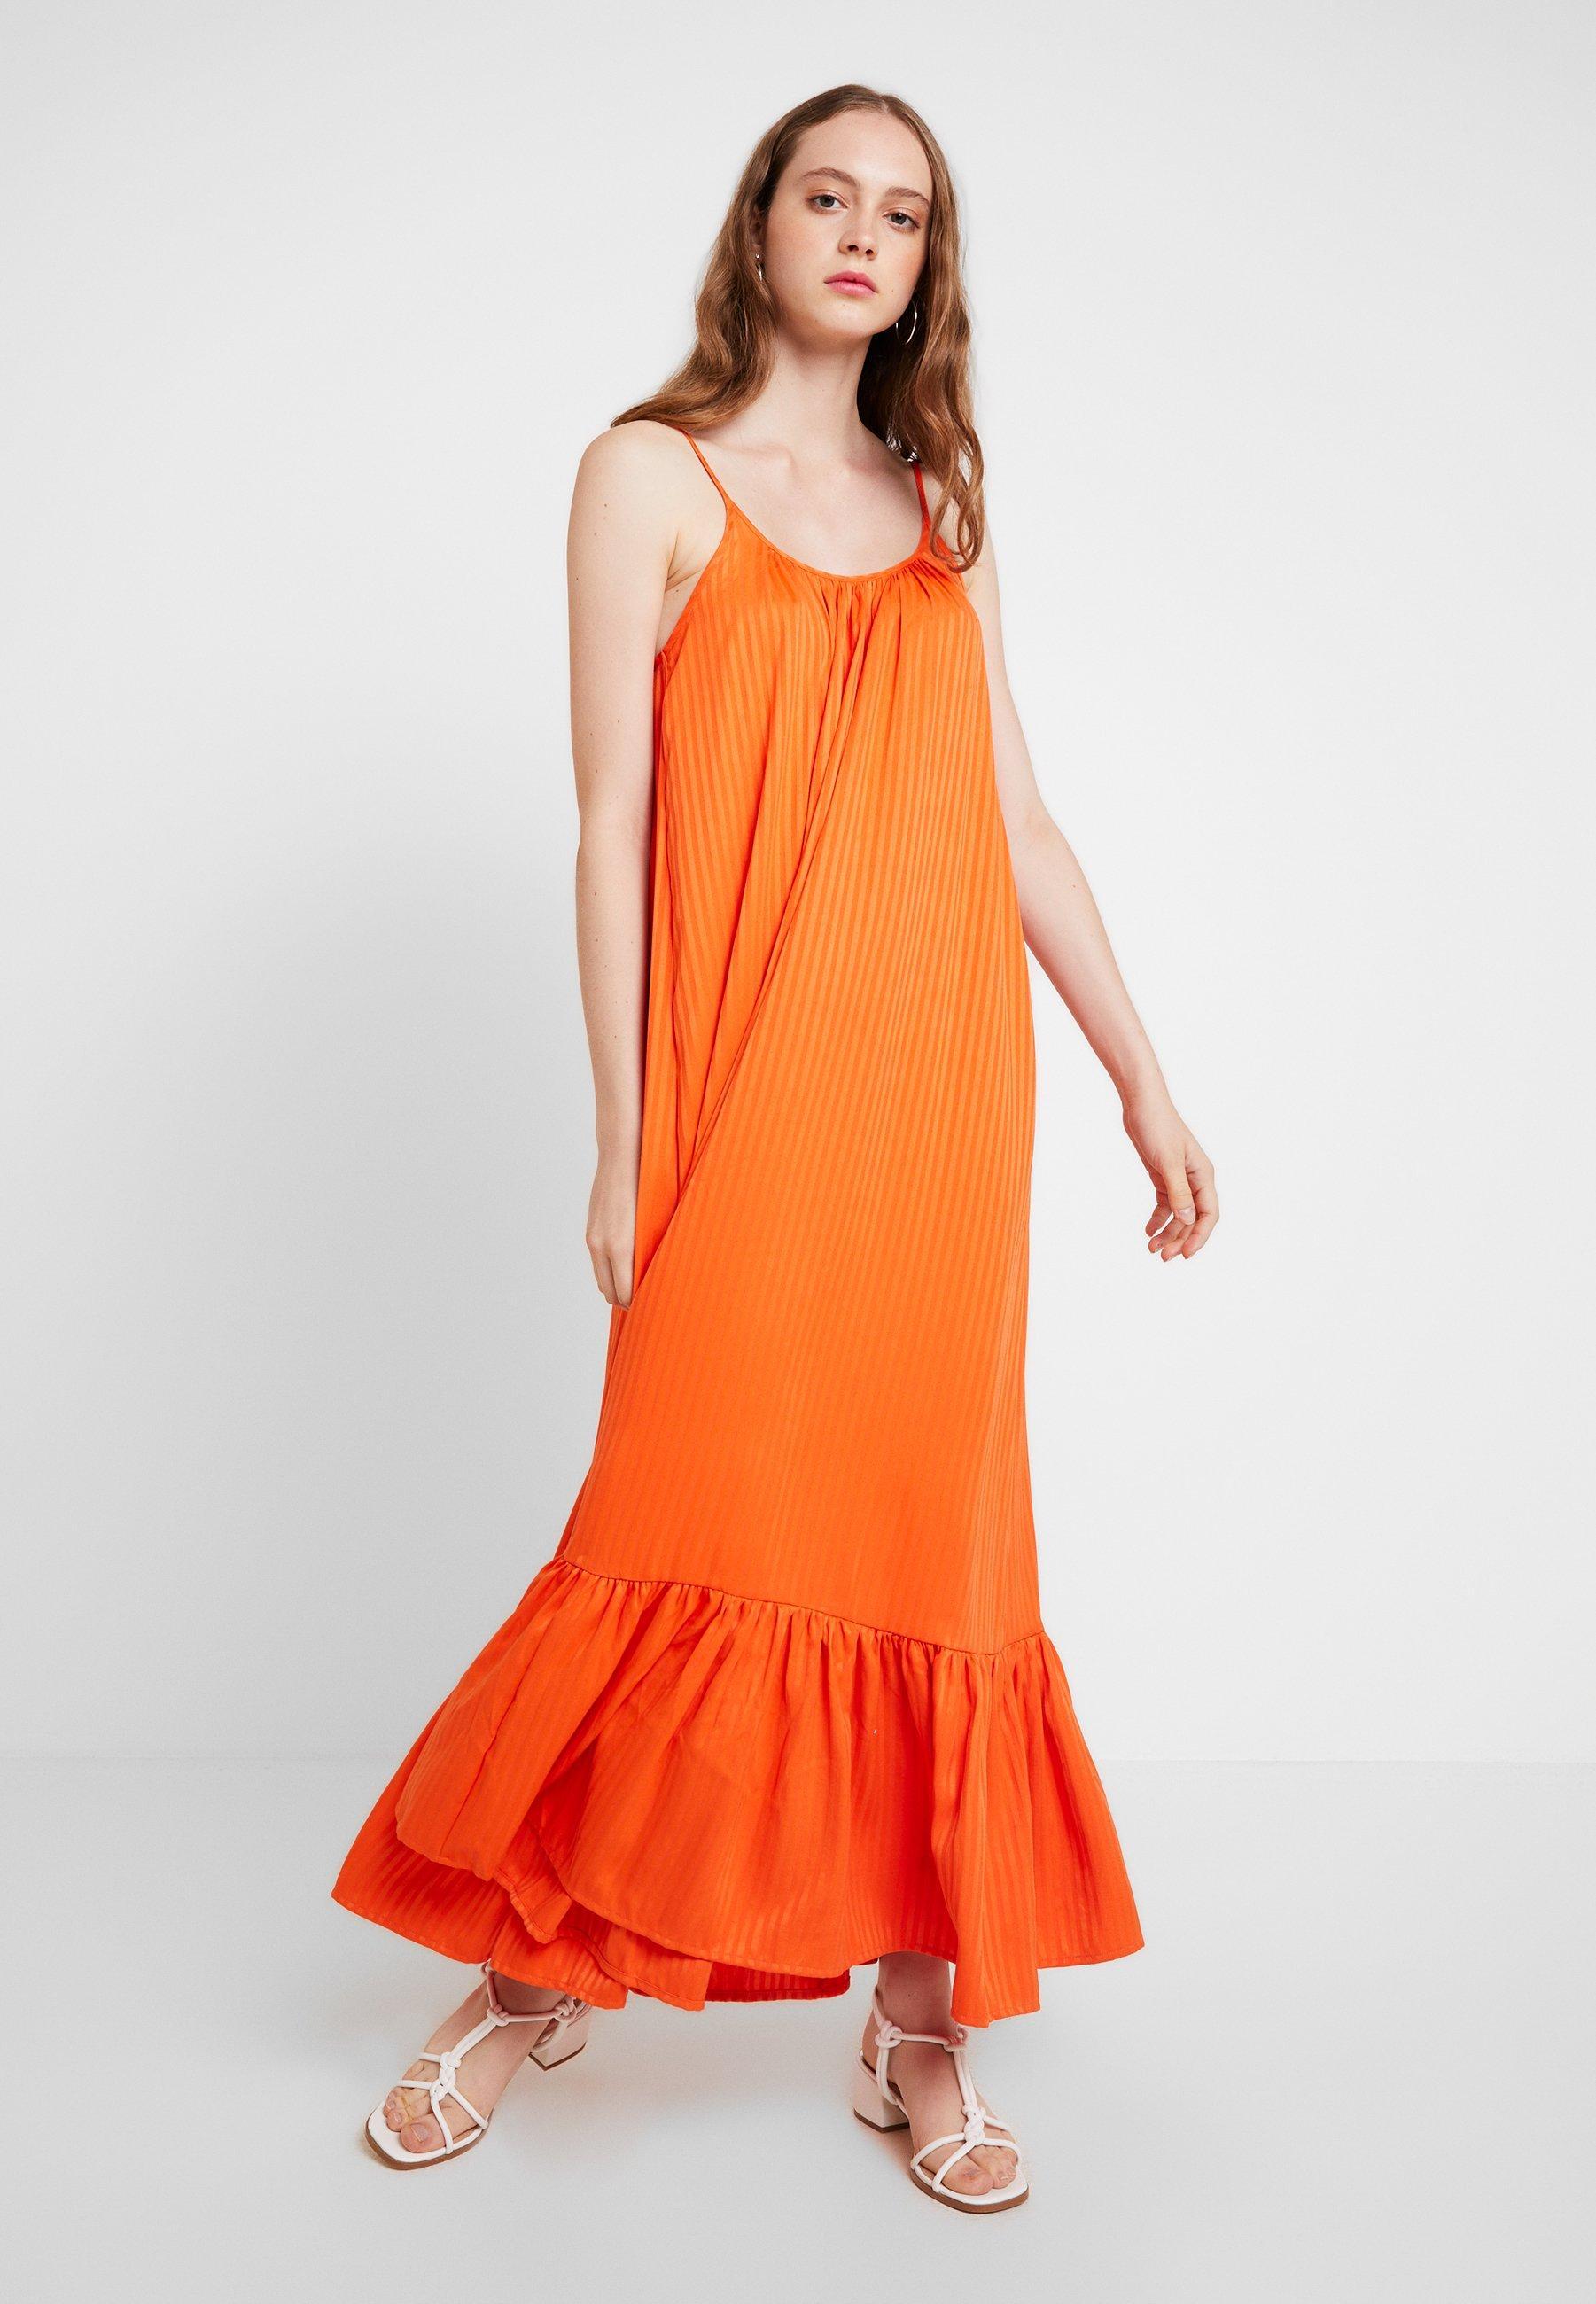 Yas Strap Tango Longue Yasleora DressRobe Tangerine gyv6IY7fbm